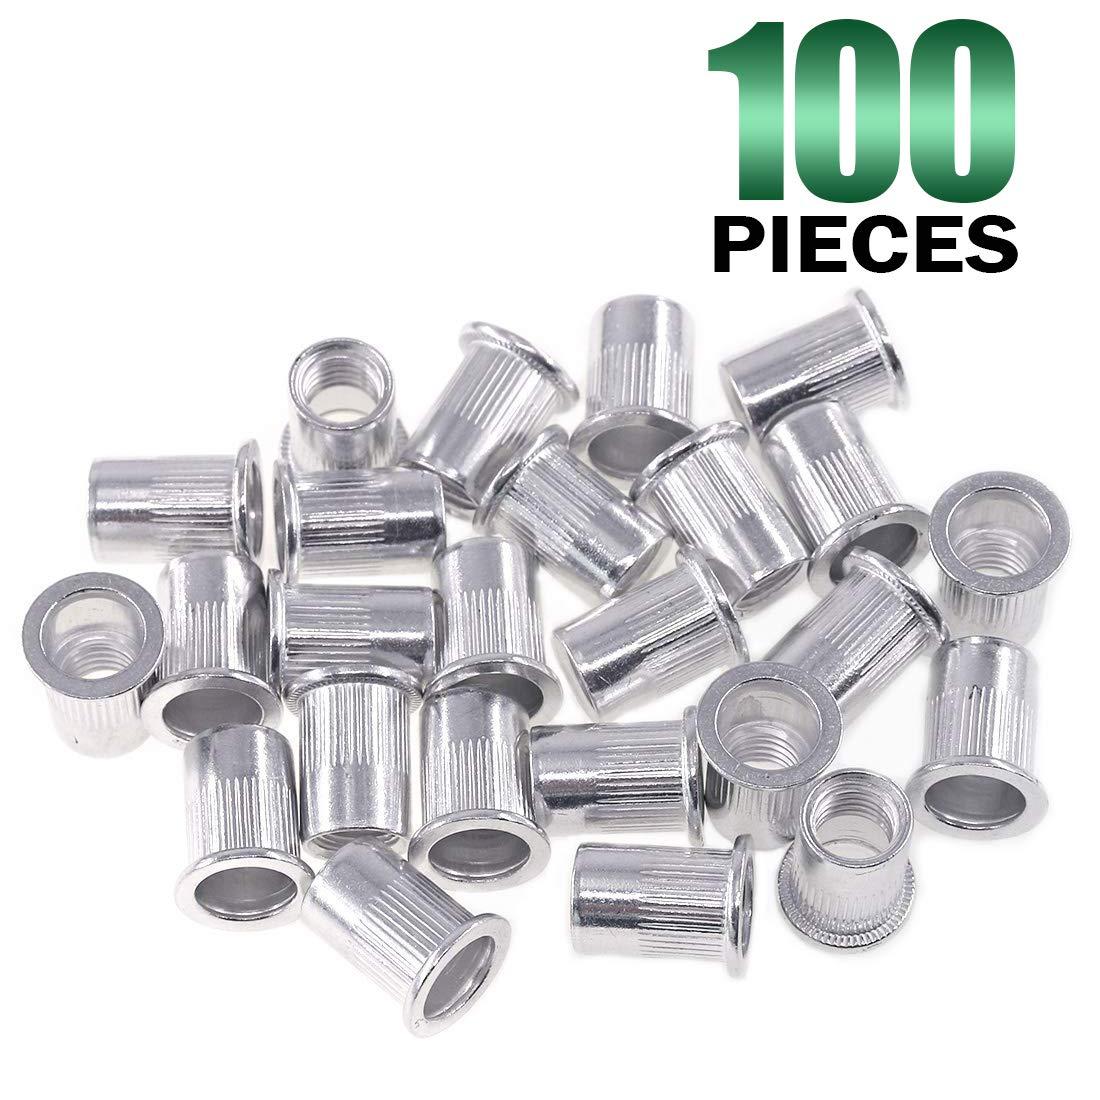 Keadic 100Pcs Aluminum Rivet Nut Metric Flat Head Threaded Insert Nutsert Kit M4